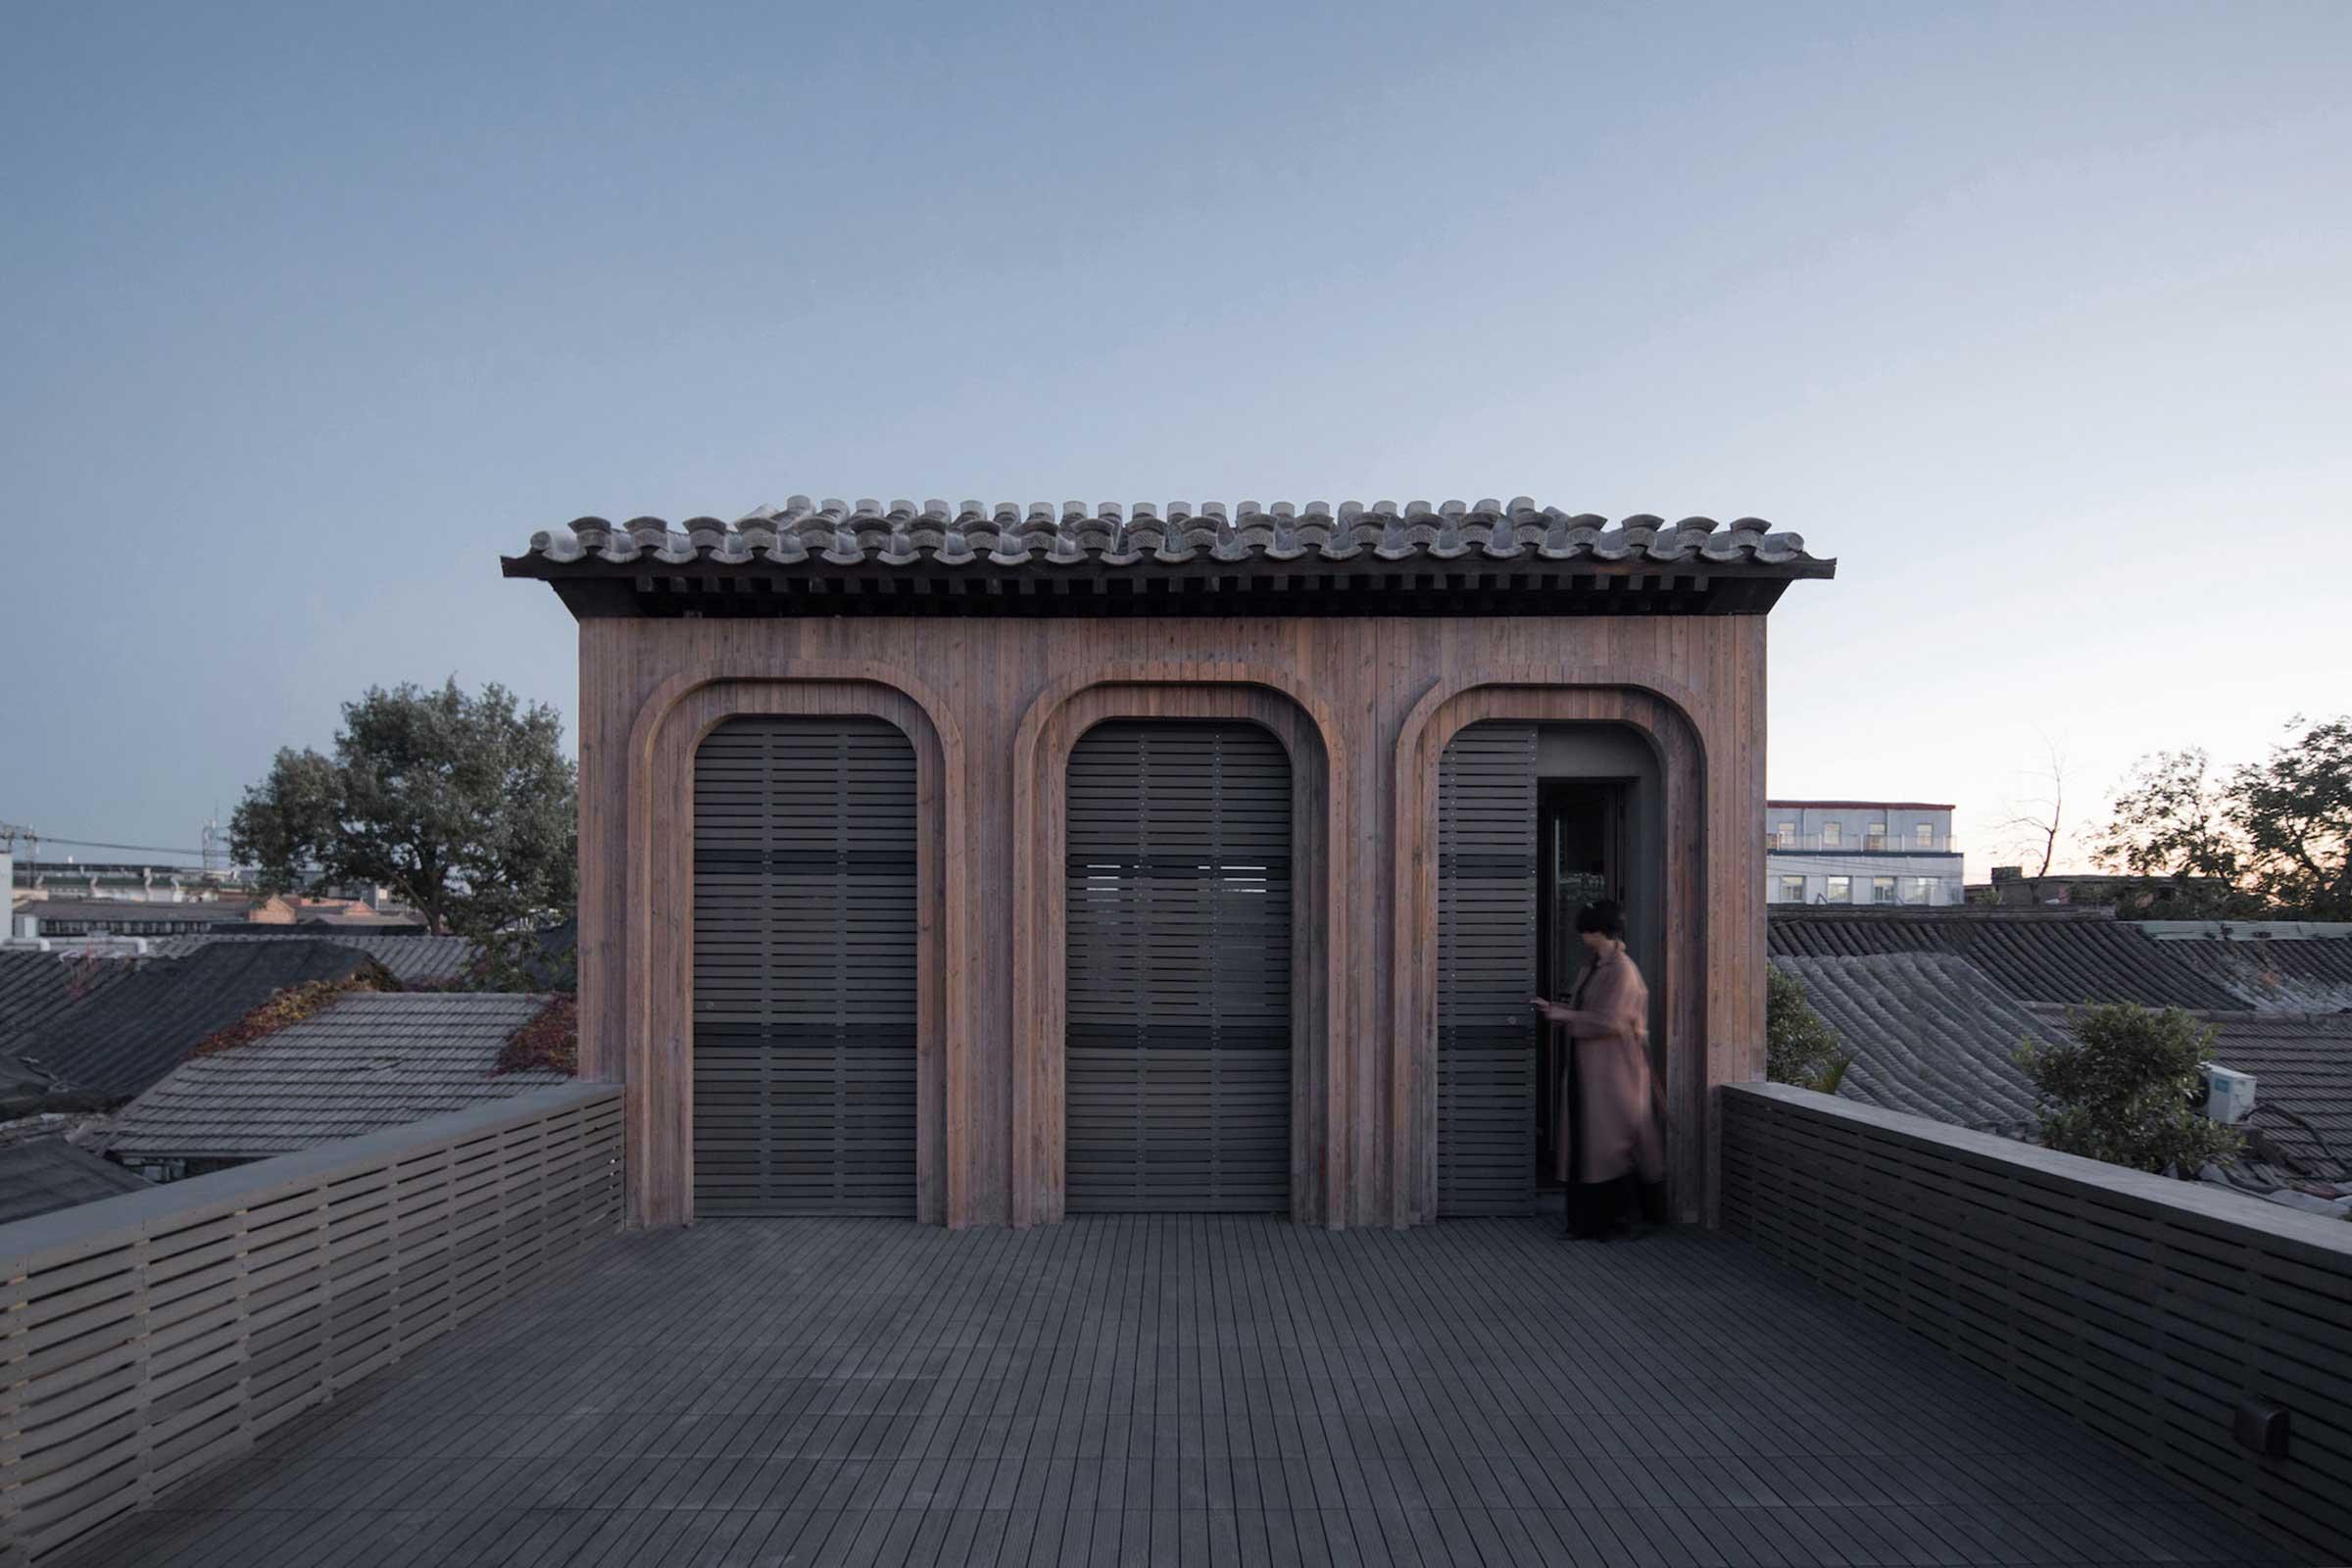 quad-house-ARCHISTRY-nolan-chao-33--second-floor-facade.jpg